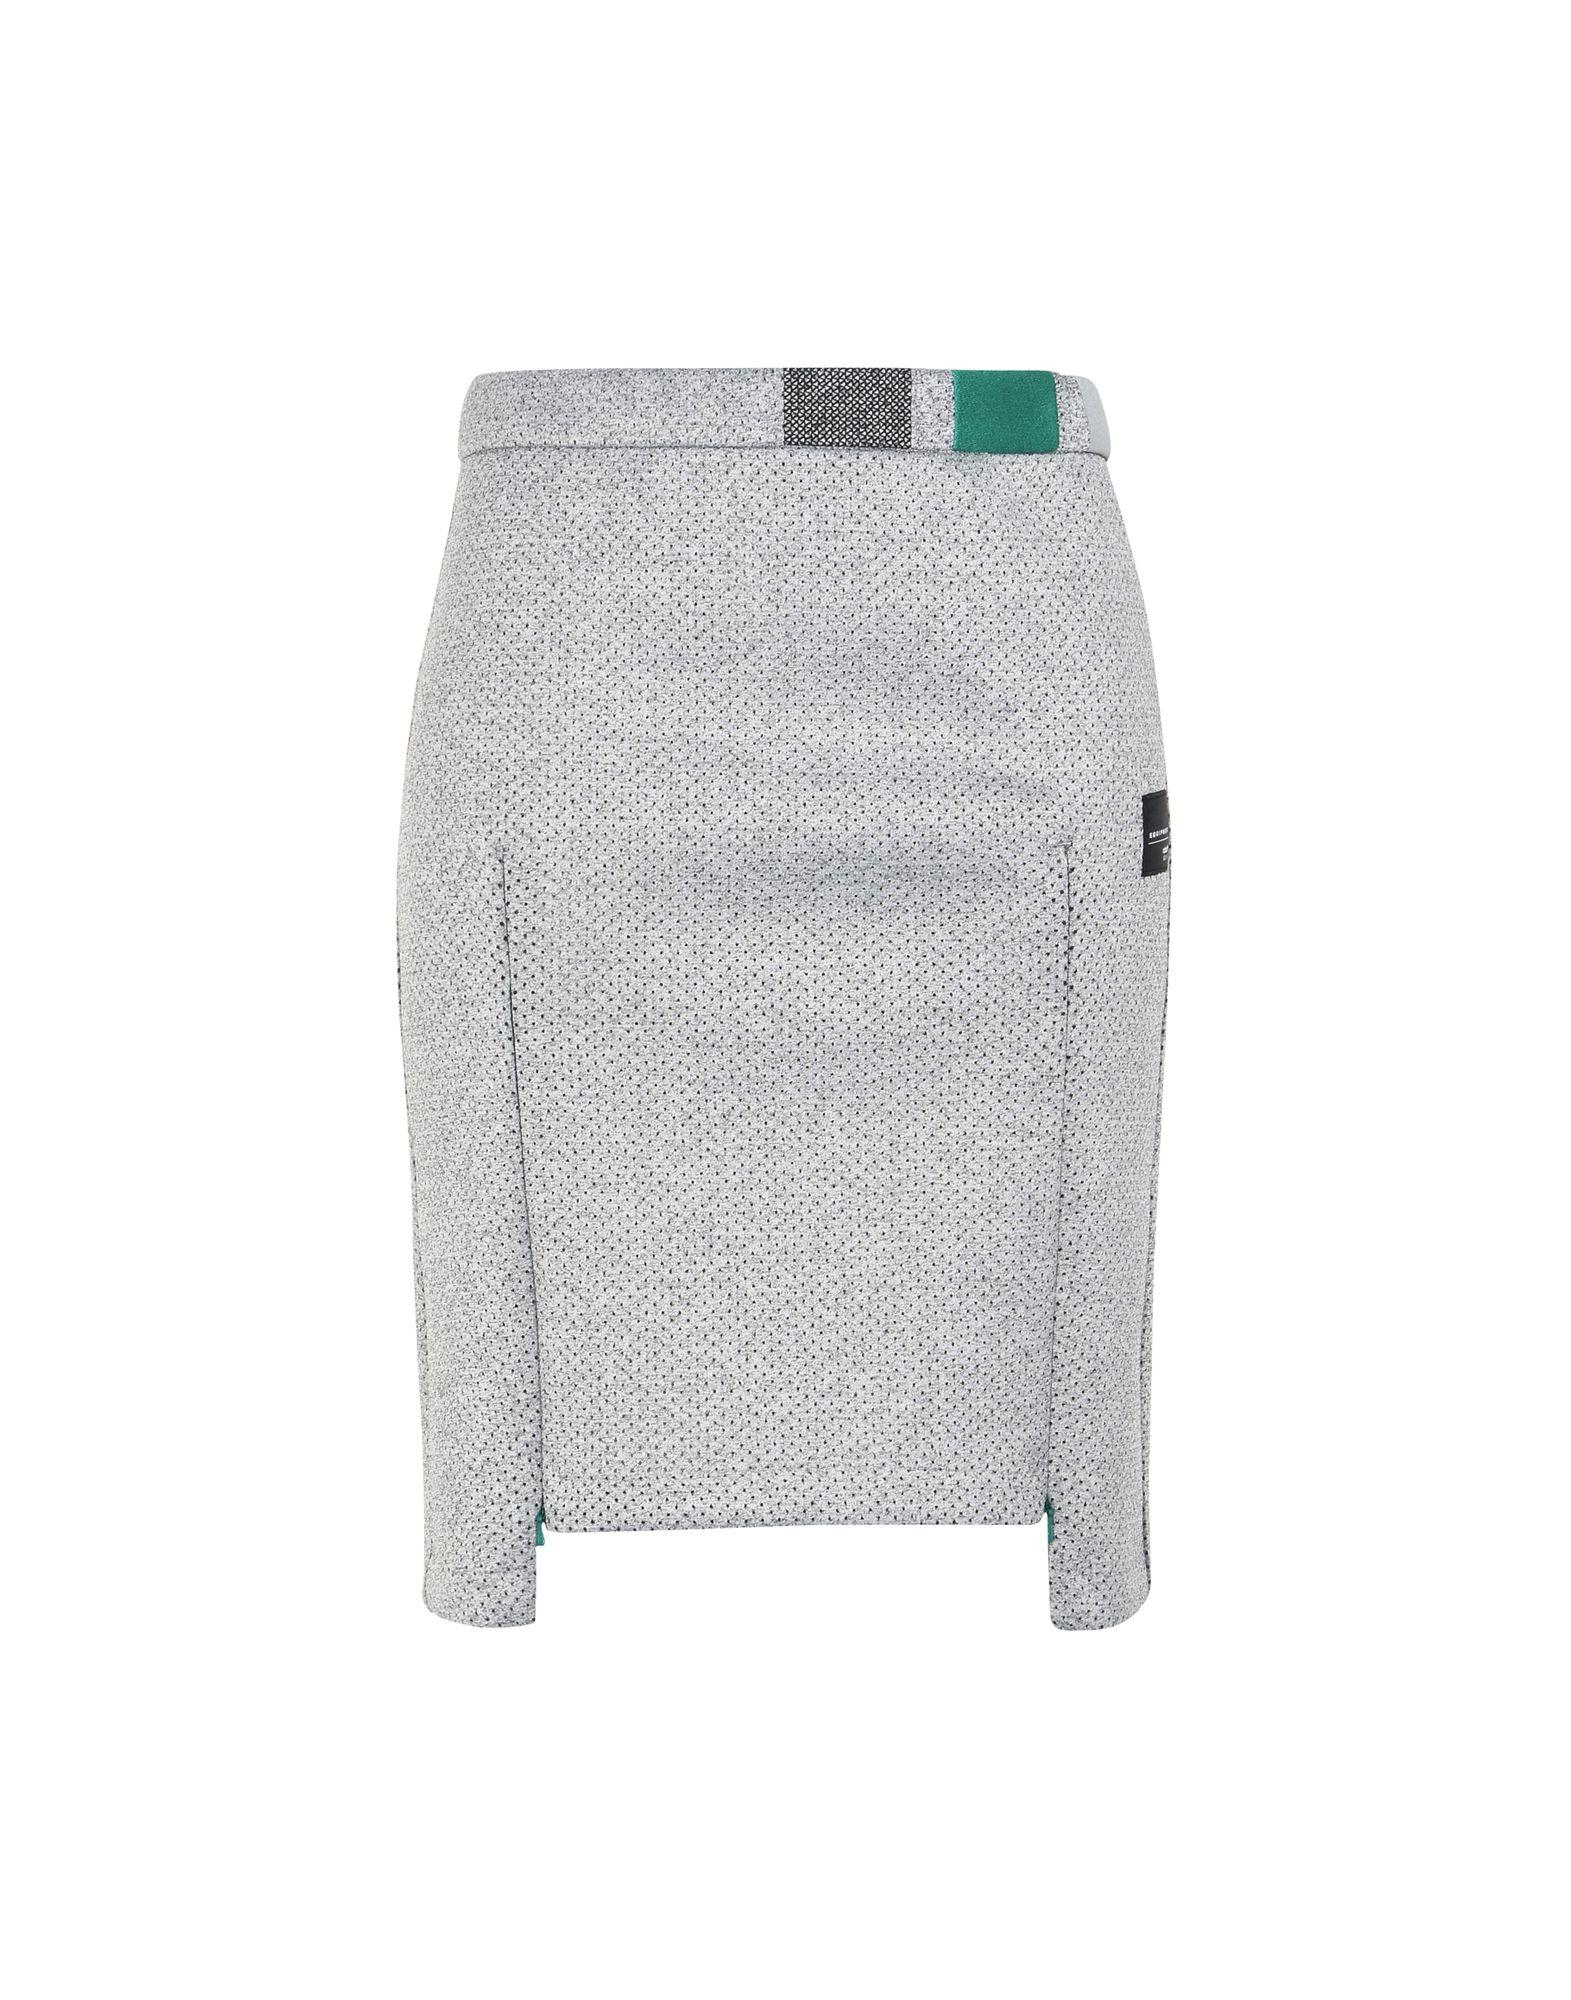 ADIDAS ORIGINALS Юбка до колена adidas originals мини юбка